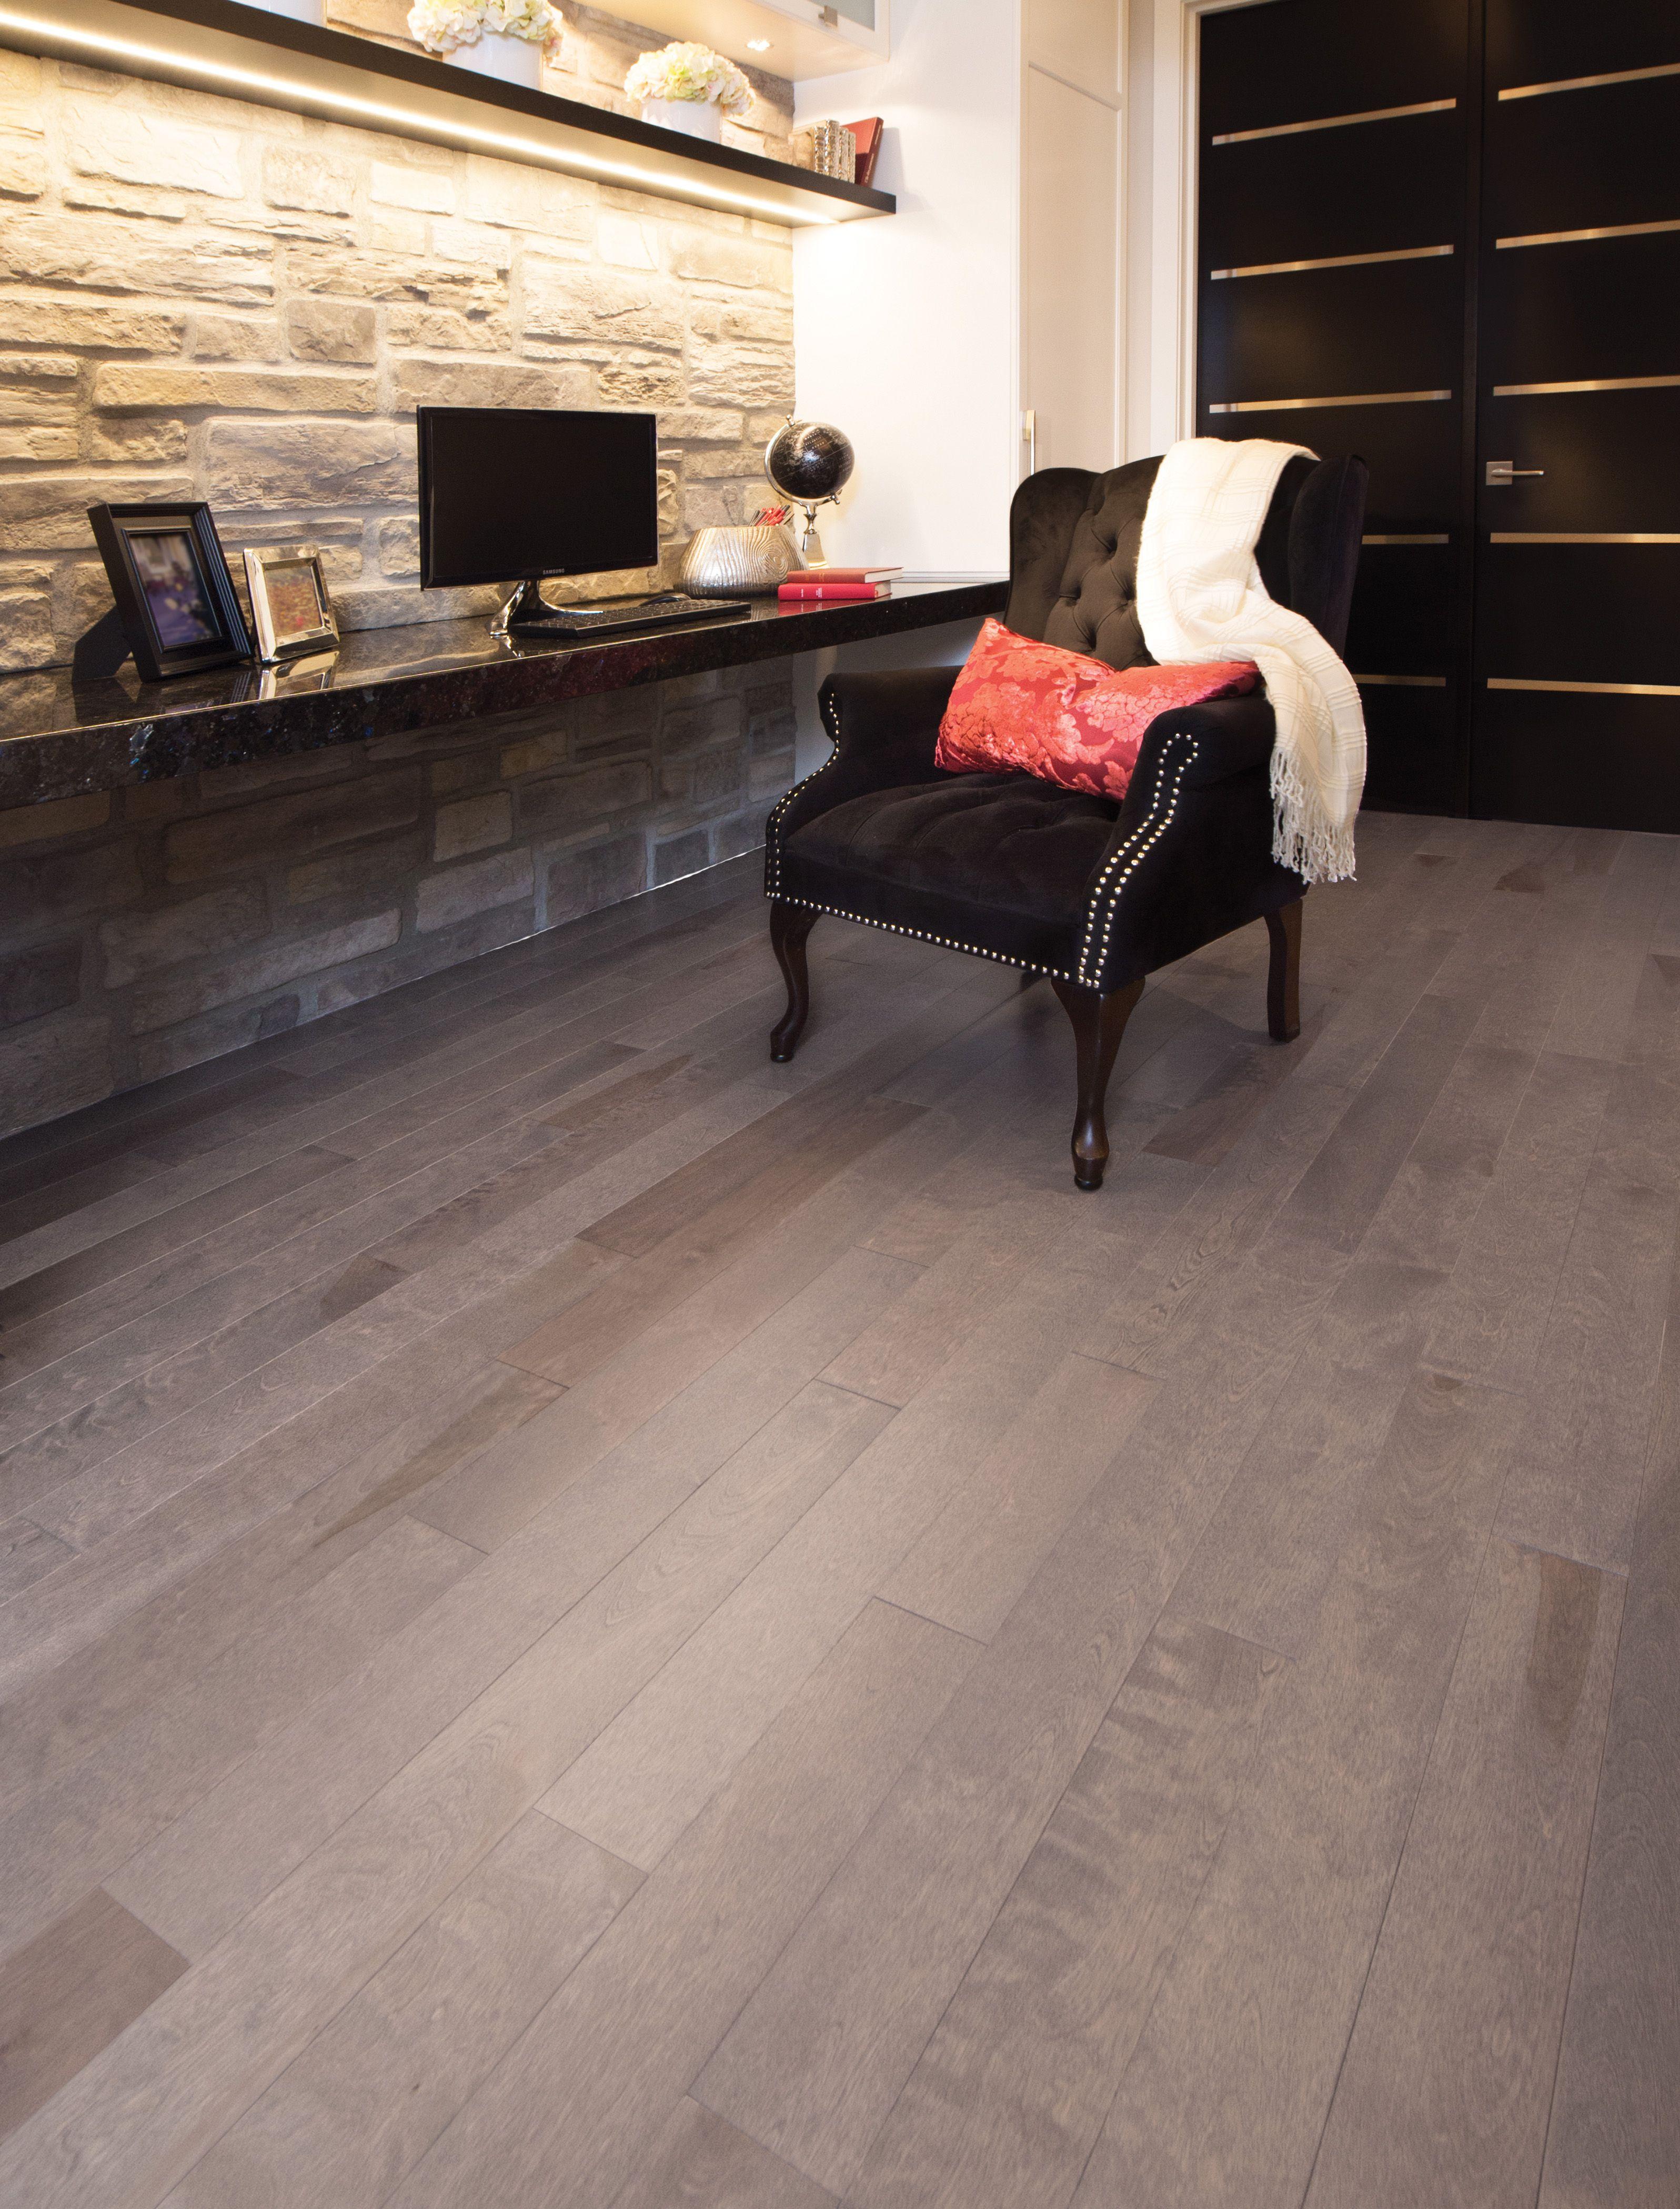 Mirage Floors, The Worldu0027s Finest And Best Hardwood Floors. Yellow Birch  Greystone #mirage